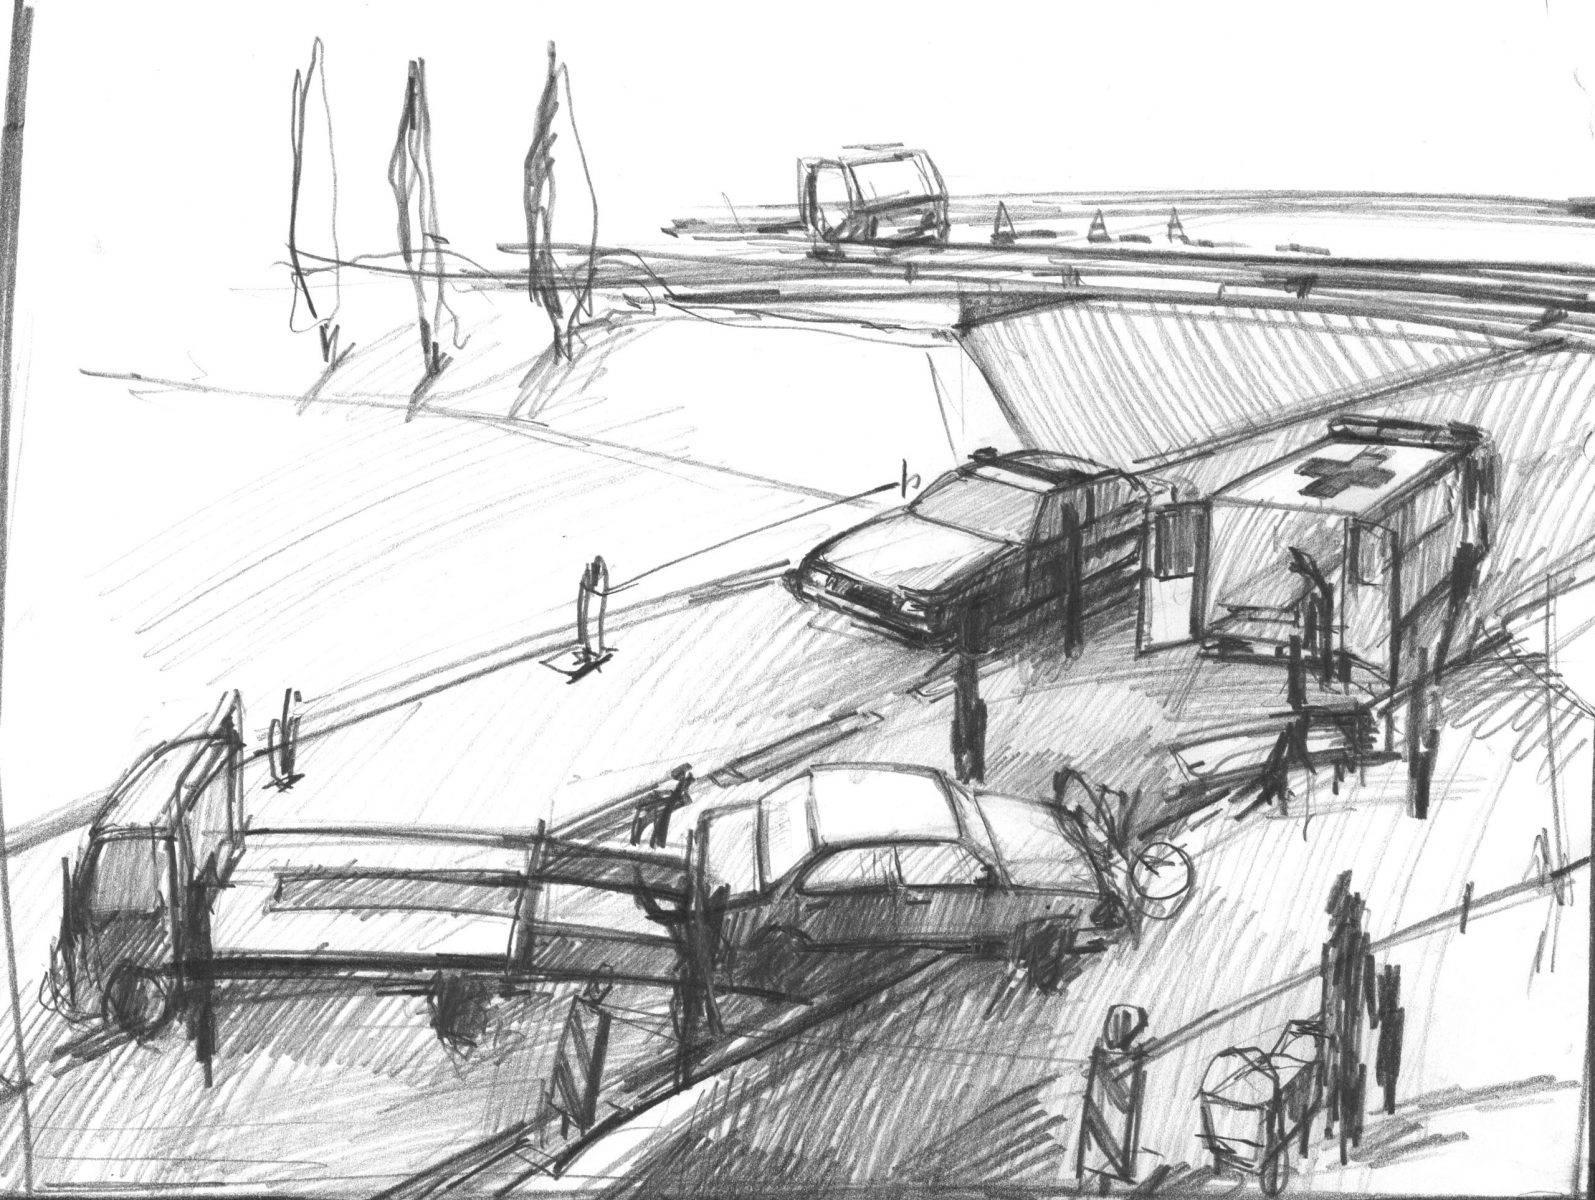 Esplanada by Jan Kadlec